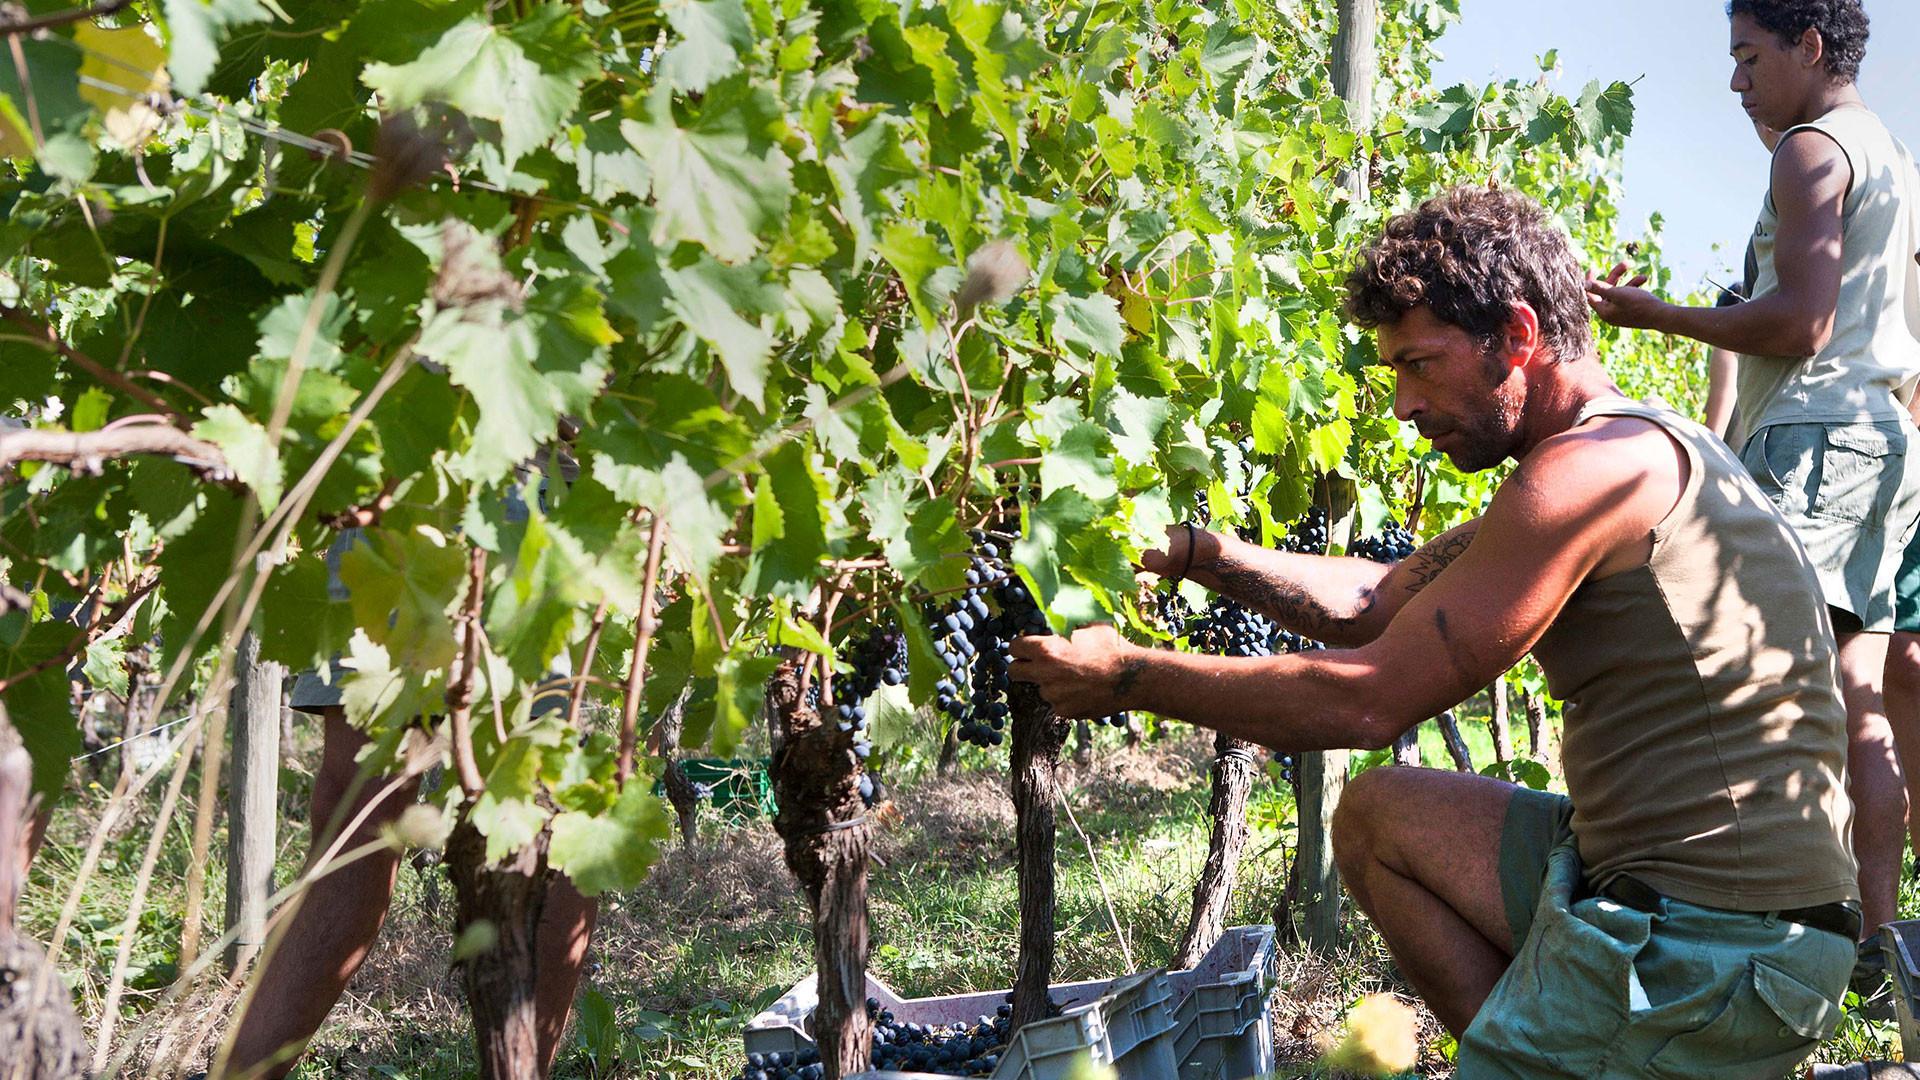 In the vineyards of San Patrignano, Italy